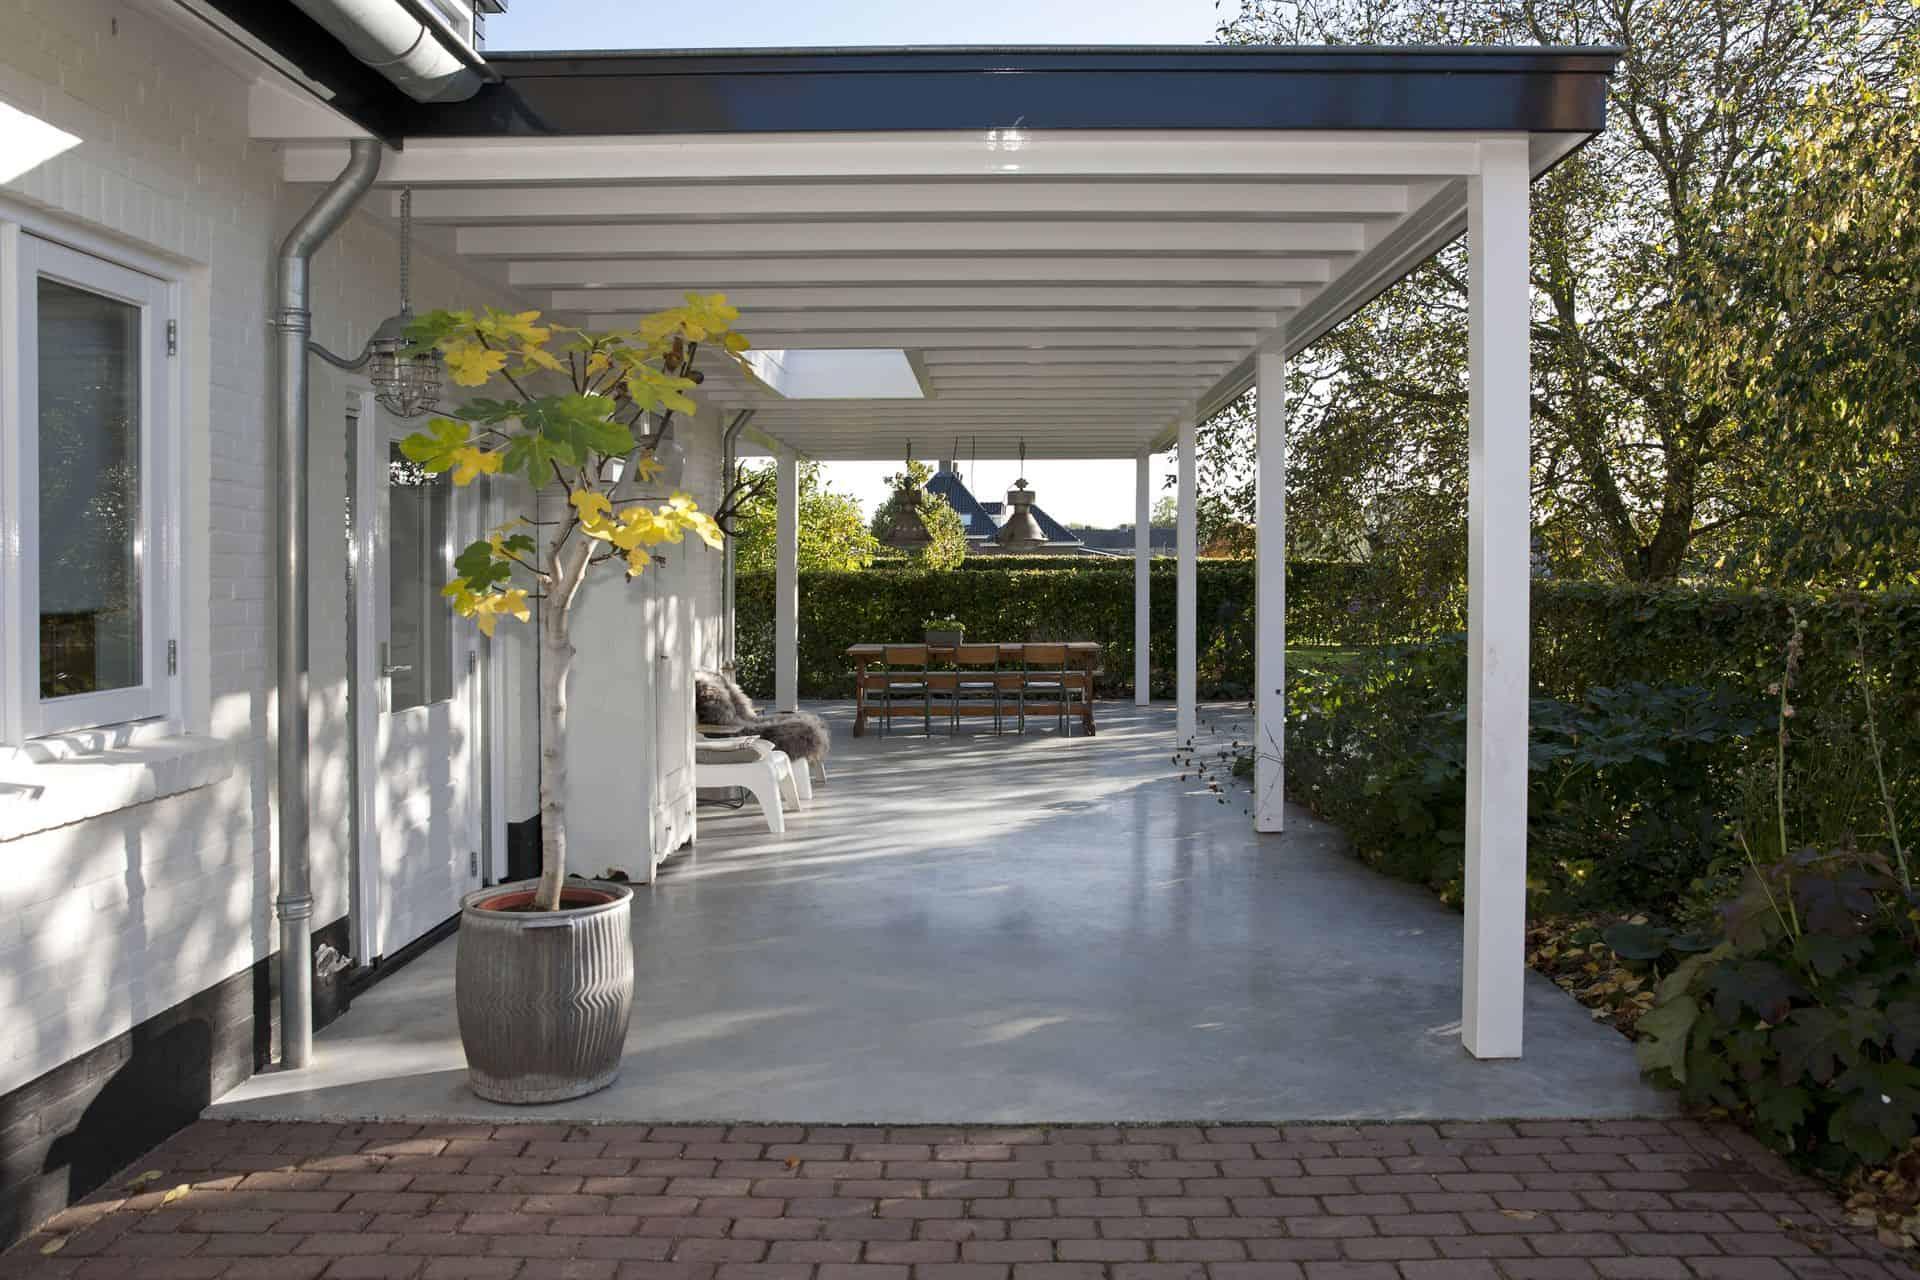 betonnen terras, beton terras, beton terras design